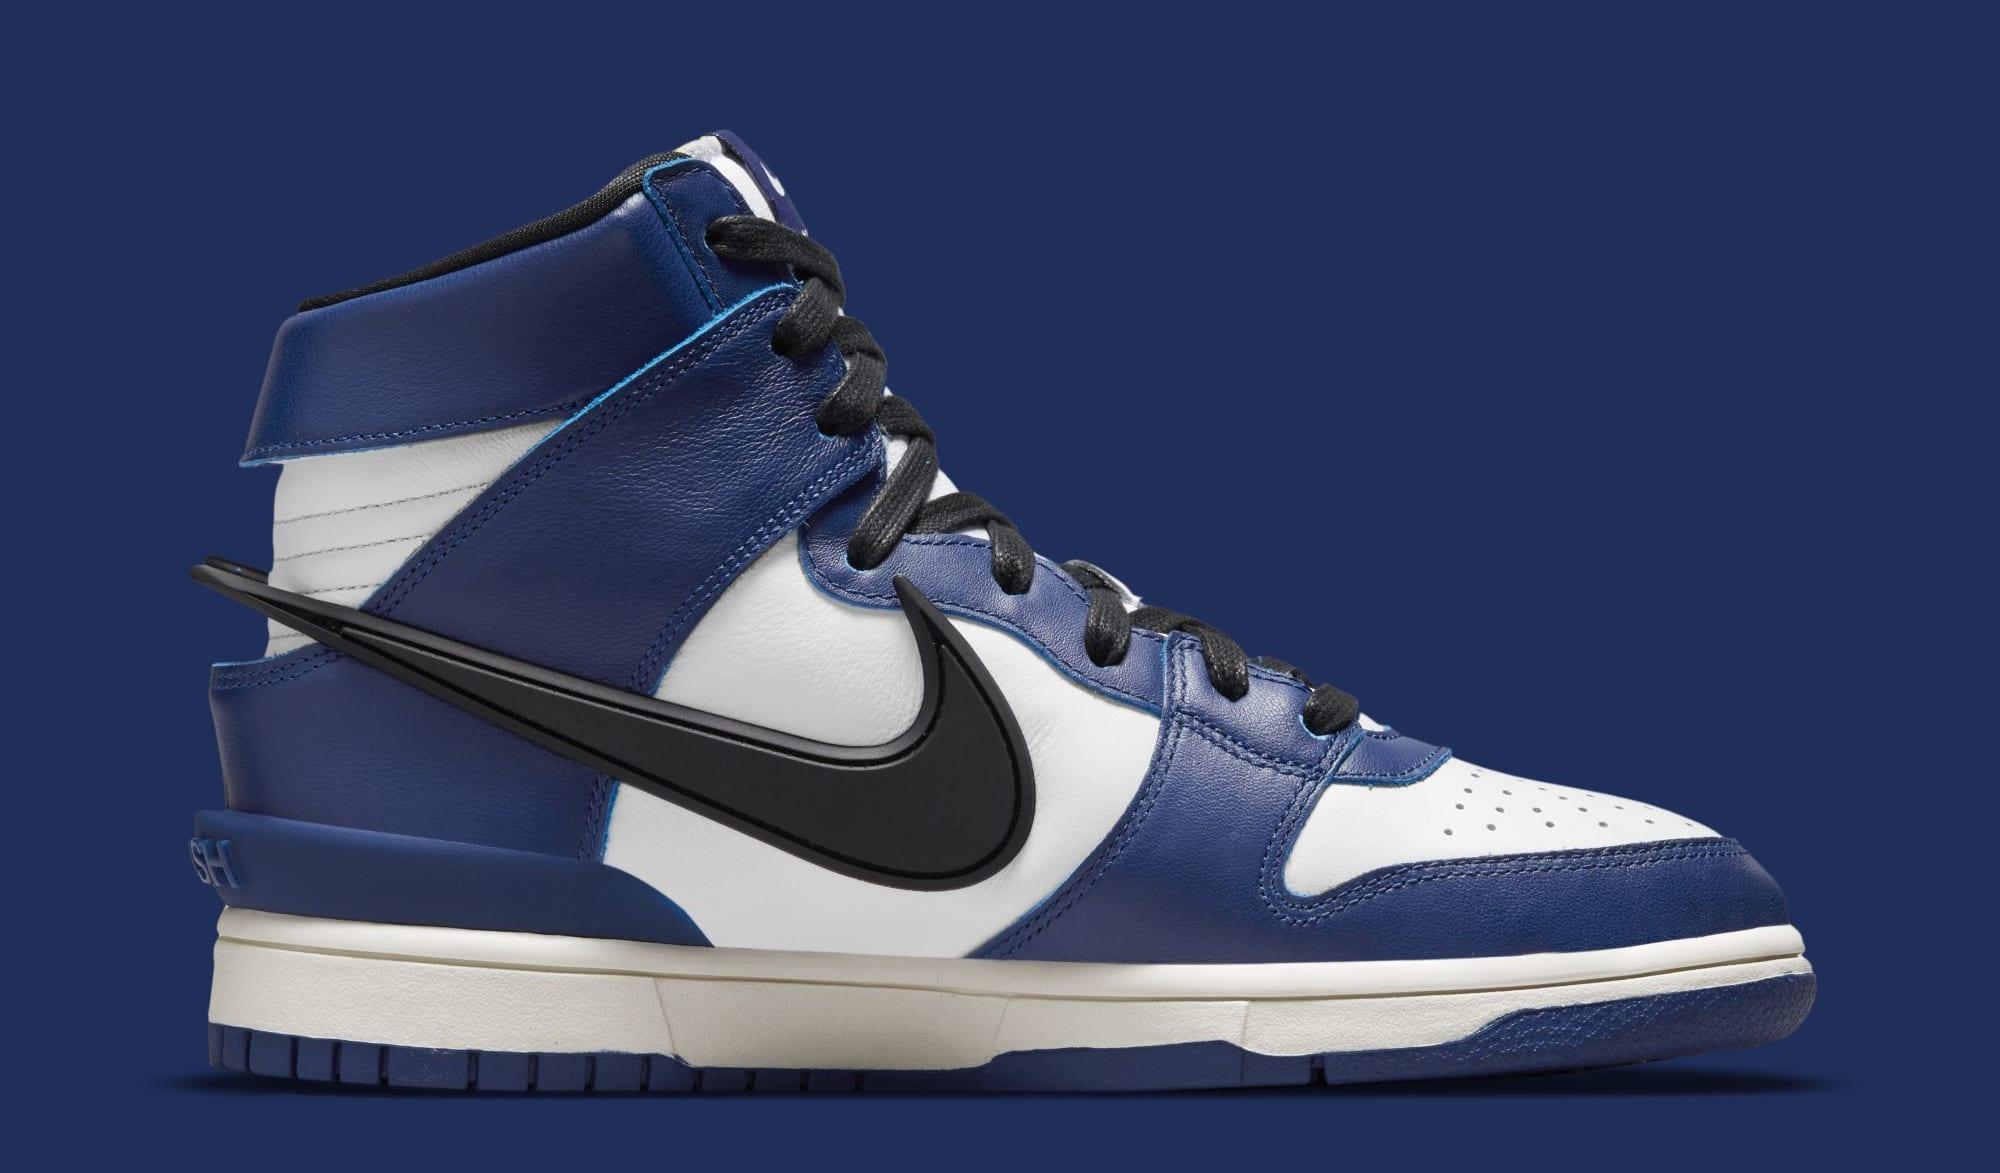 Ambush x Nike Dunk High 'Deep Royal Blue' CU7544-400 (Medial)